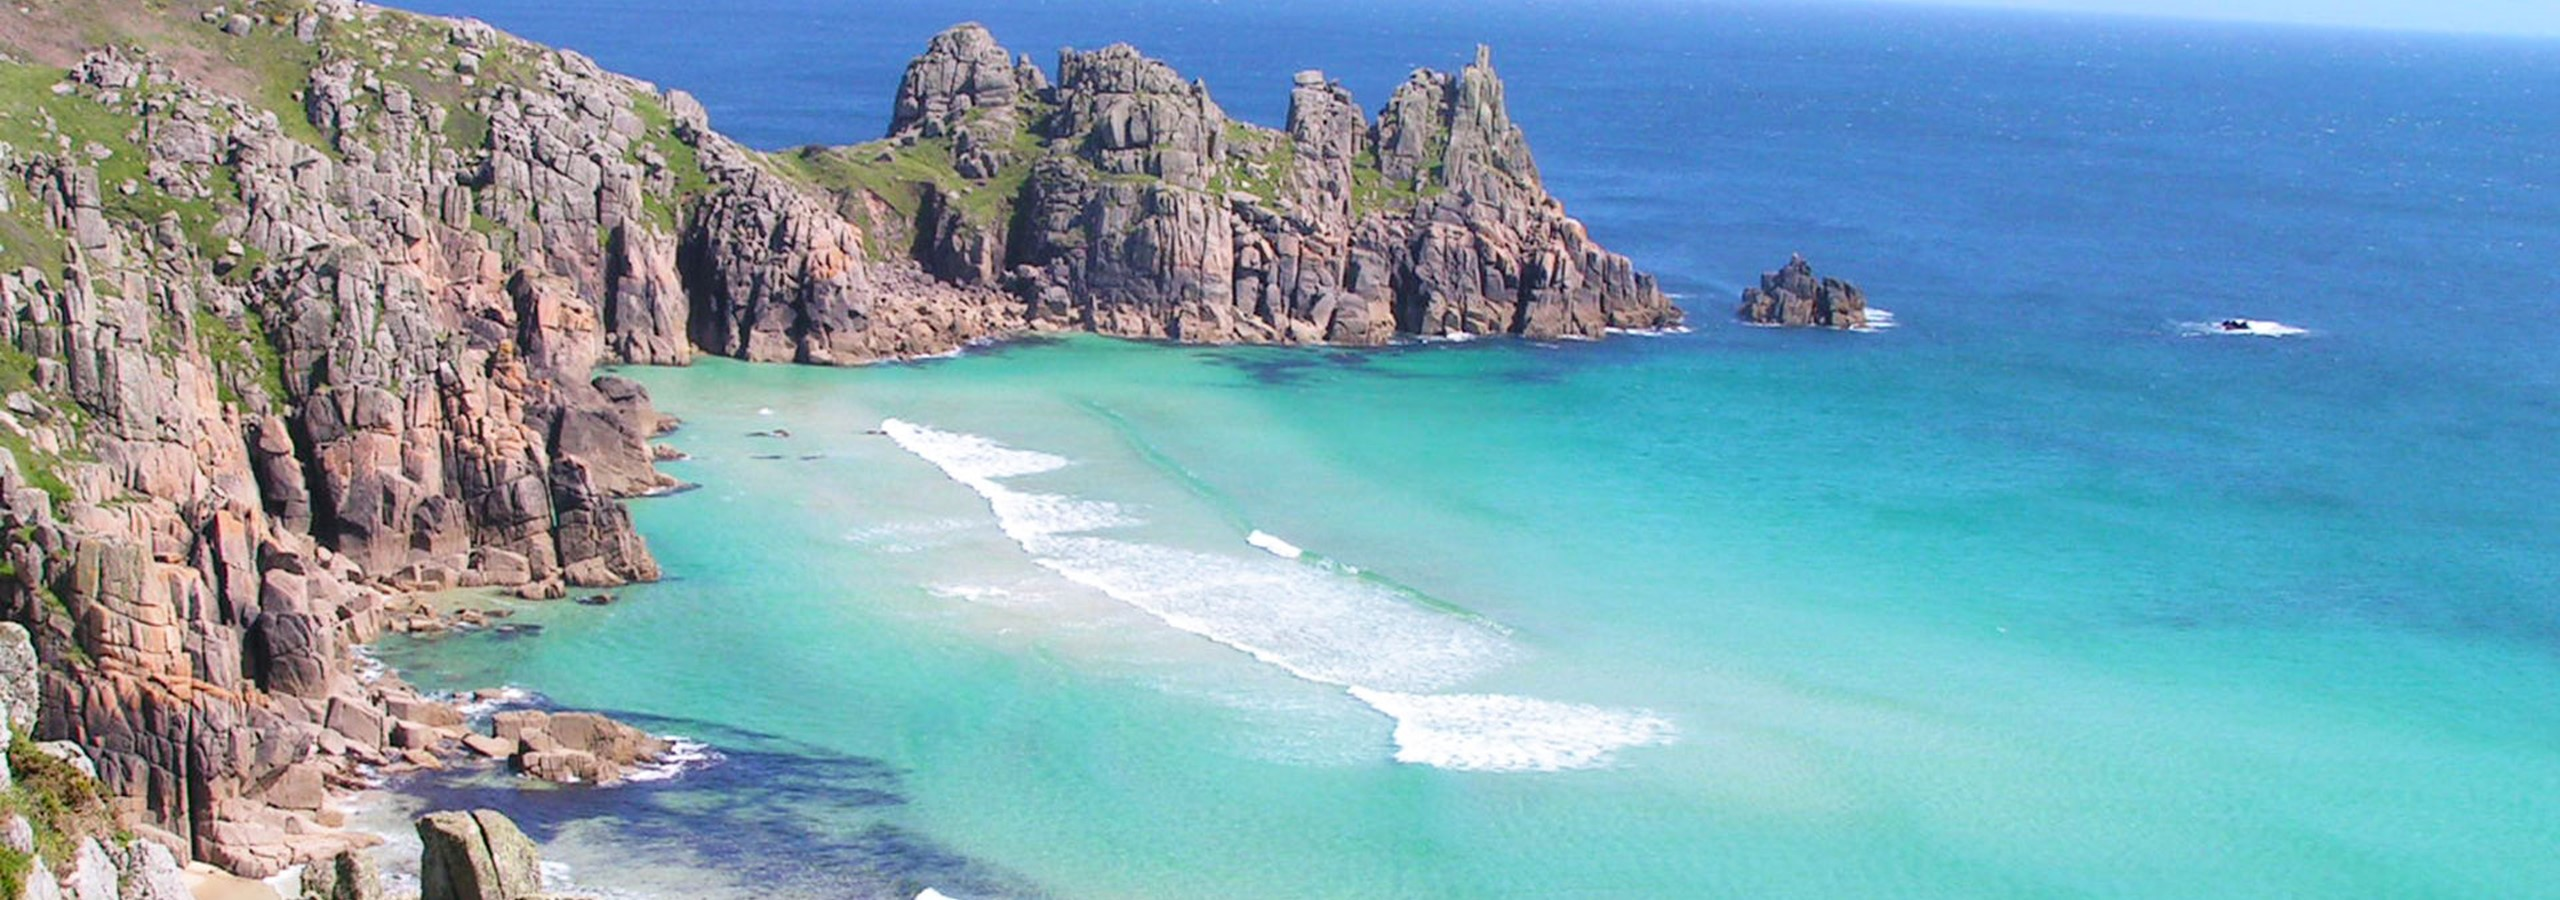 Logans Rock Porthcurno Cornwall